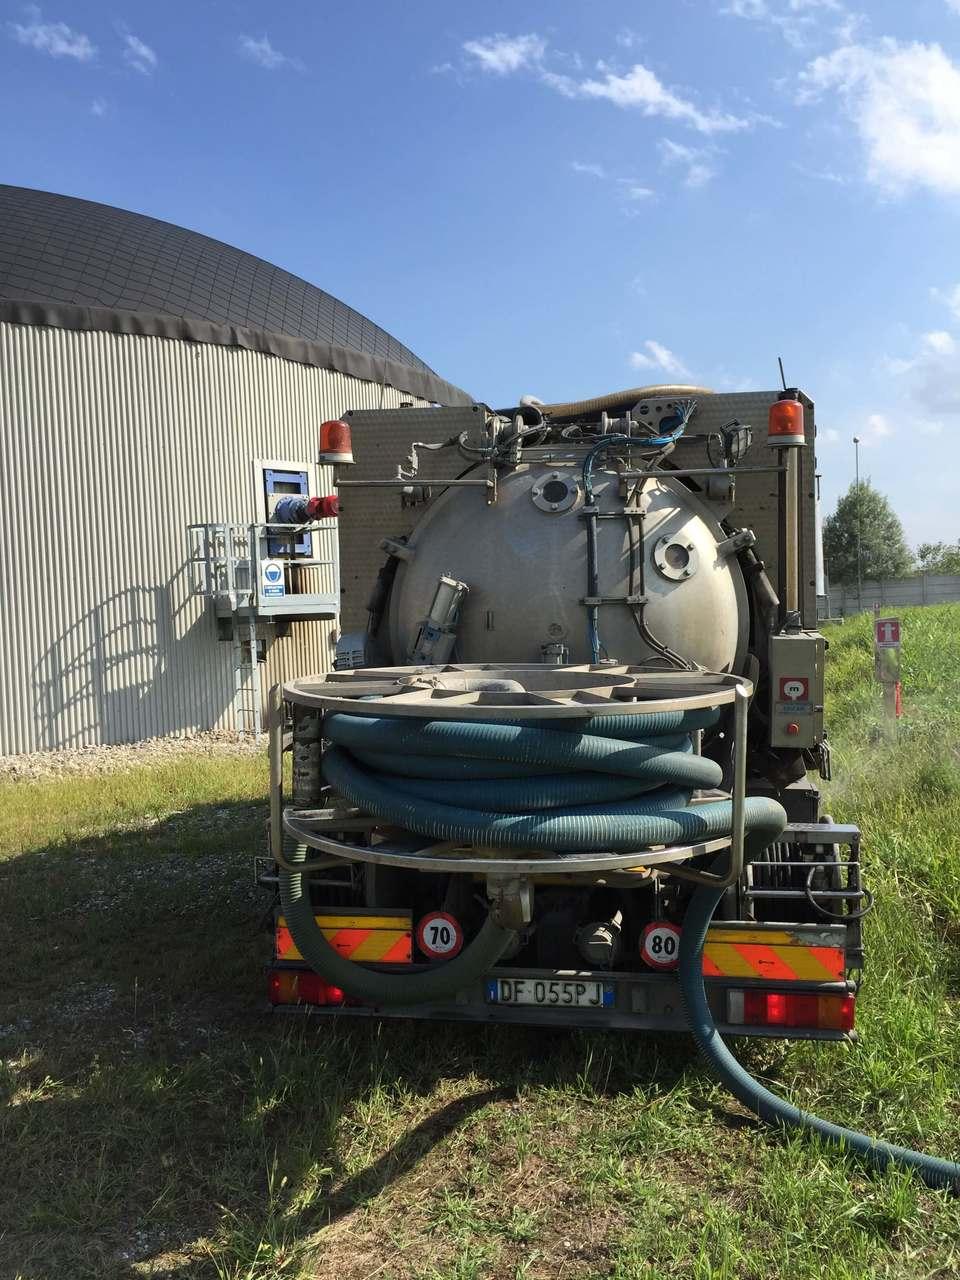 camion spurghi vicino ad una cisterna